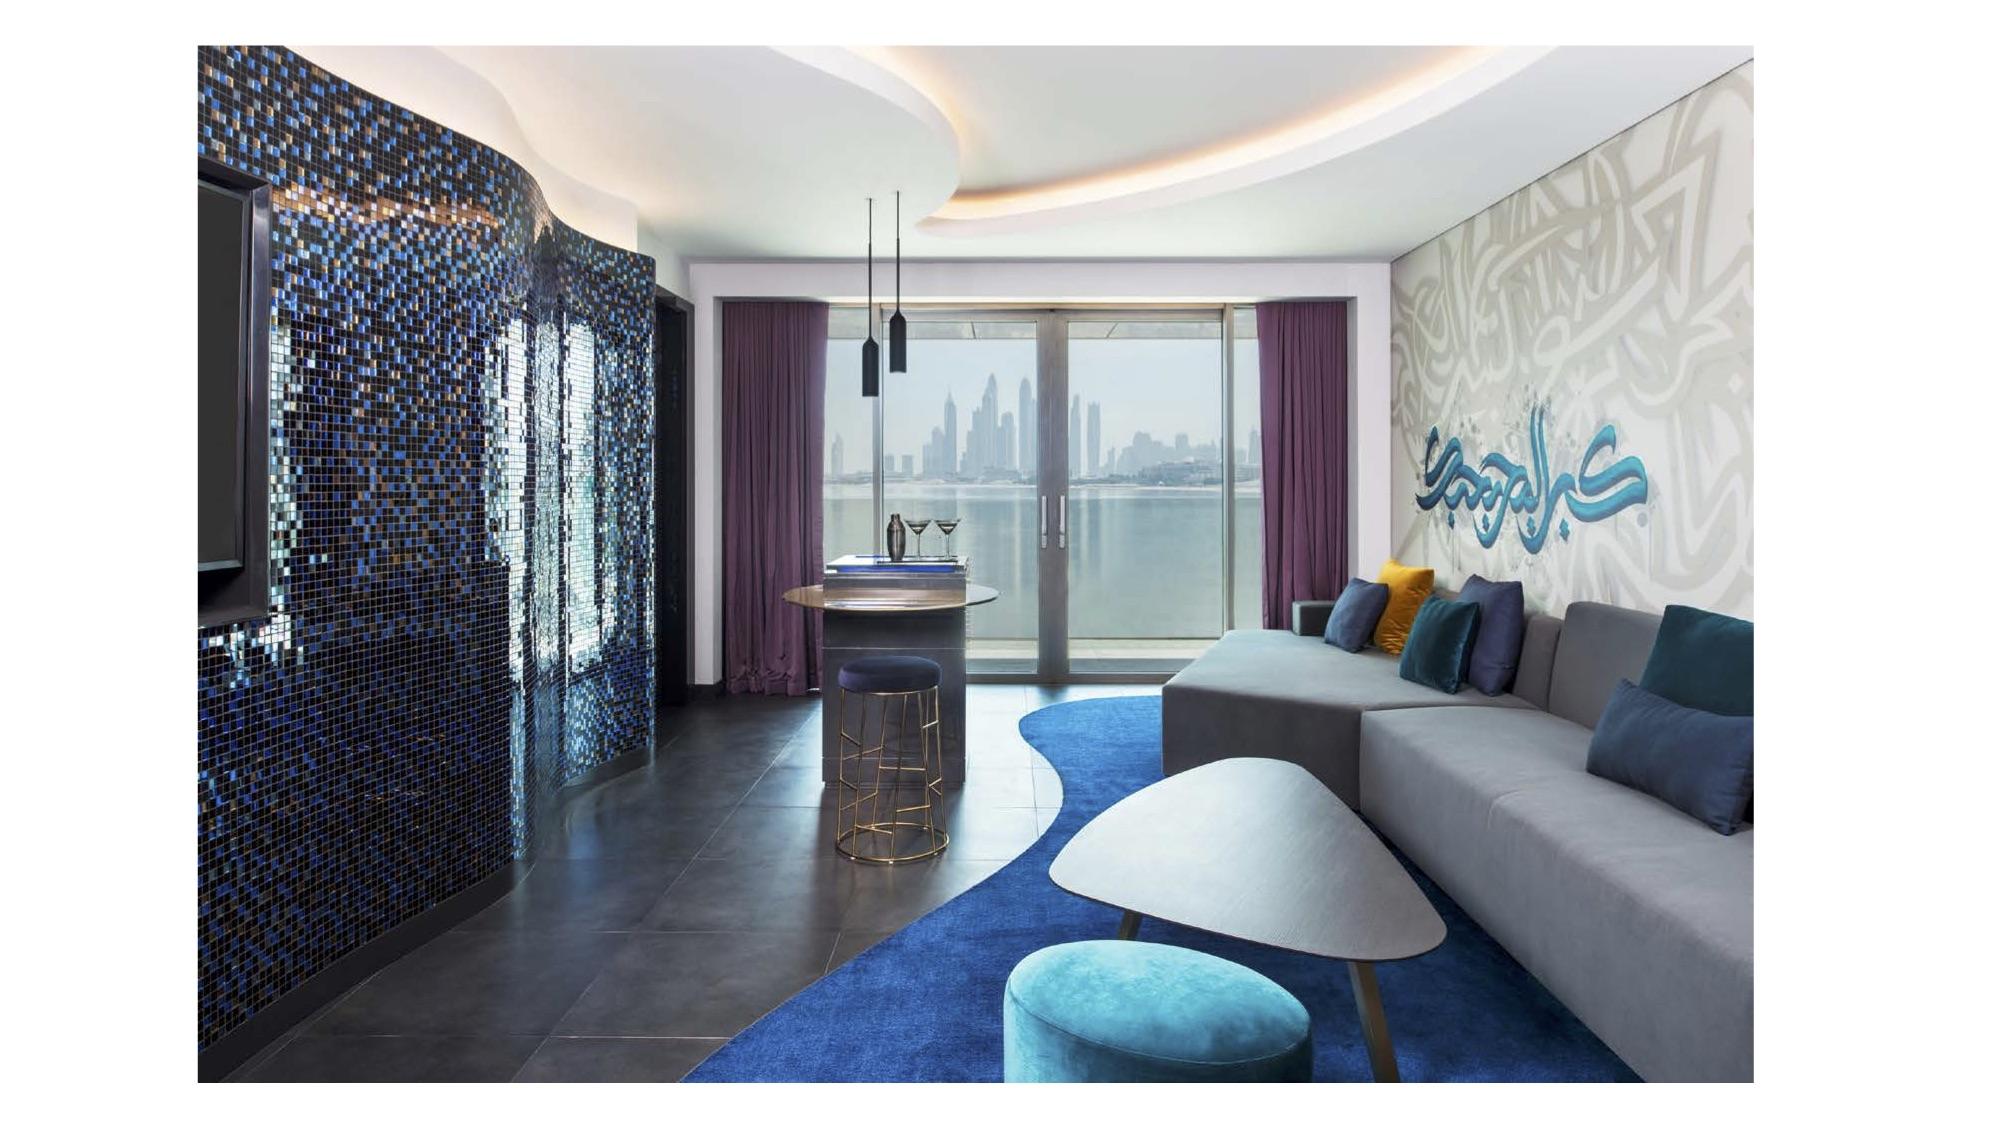 Mock Up Rooms W Hotel5.jpg